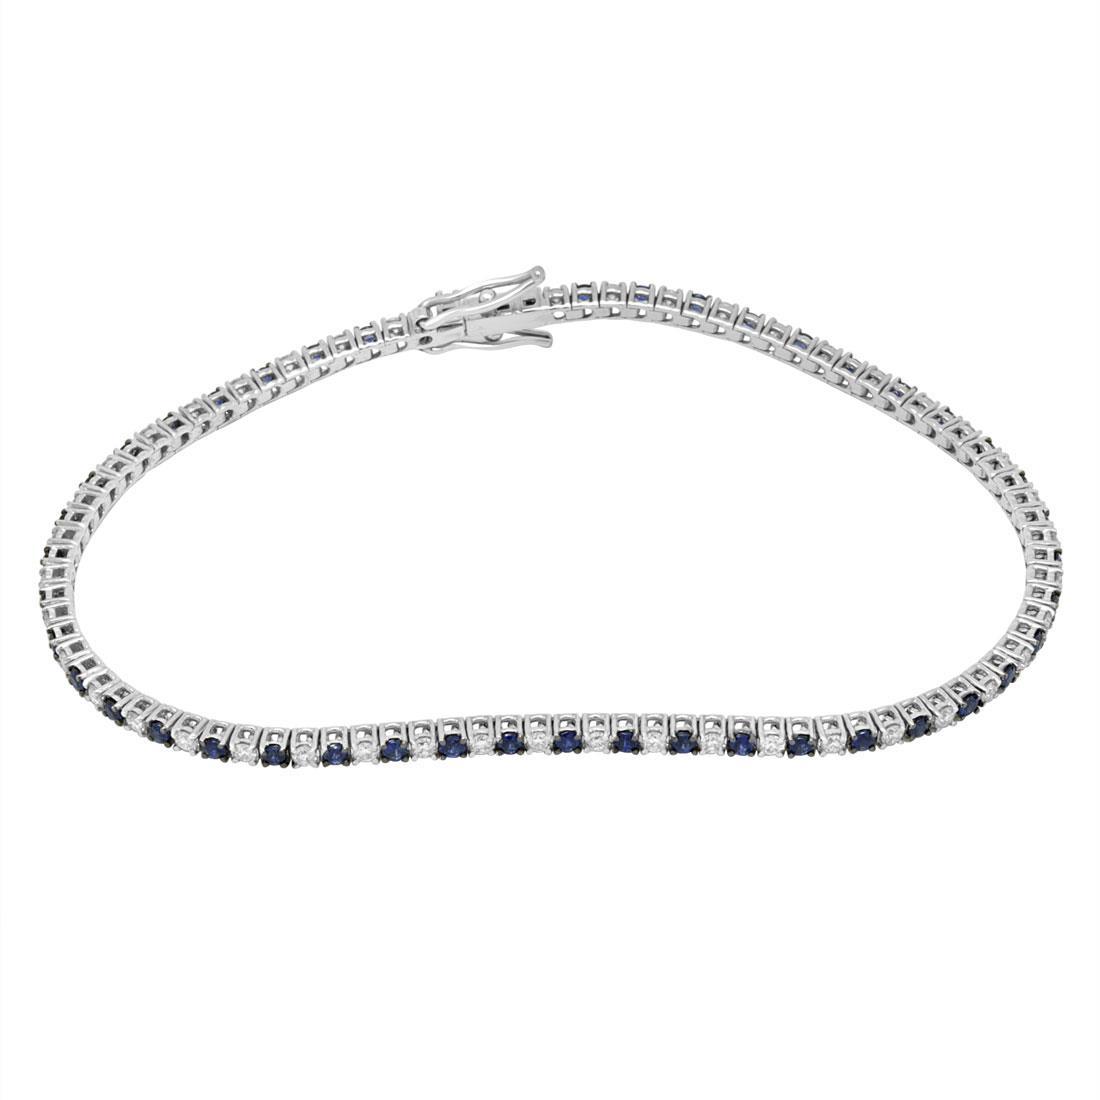 Bracciale tennis con diamanti e zaffiri - ALFIERI & ST. JOHN